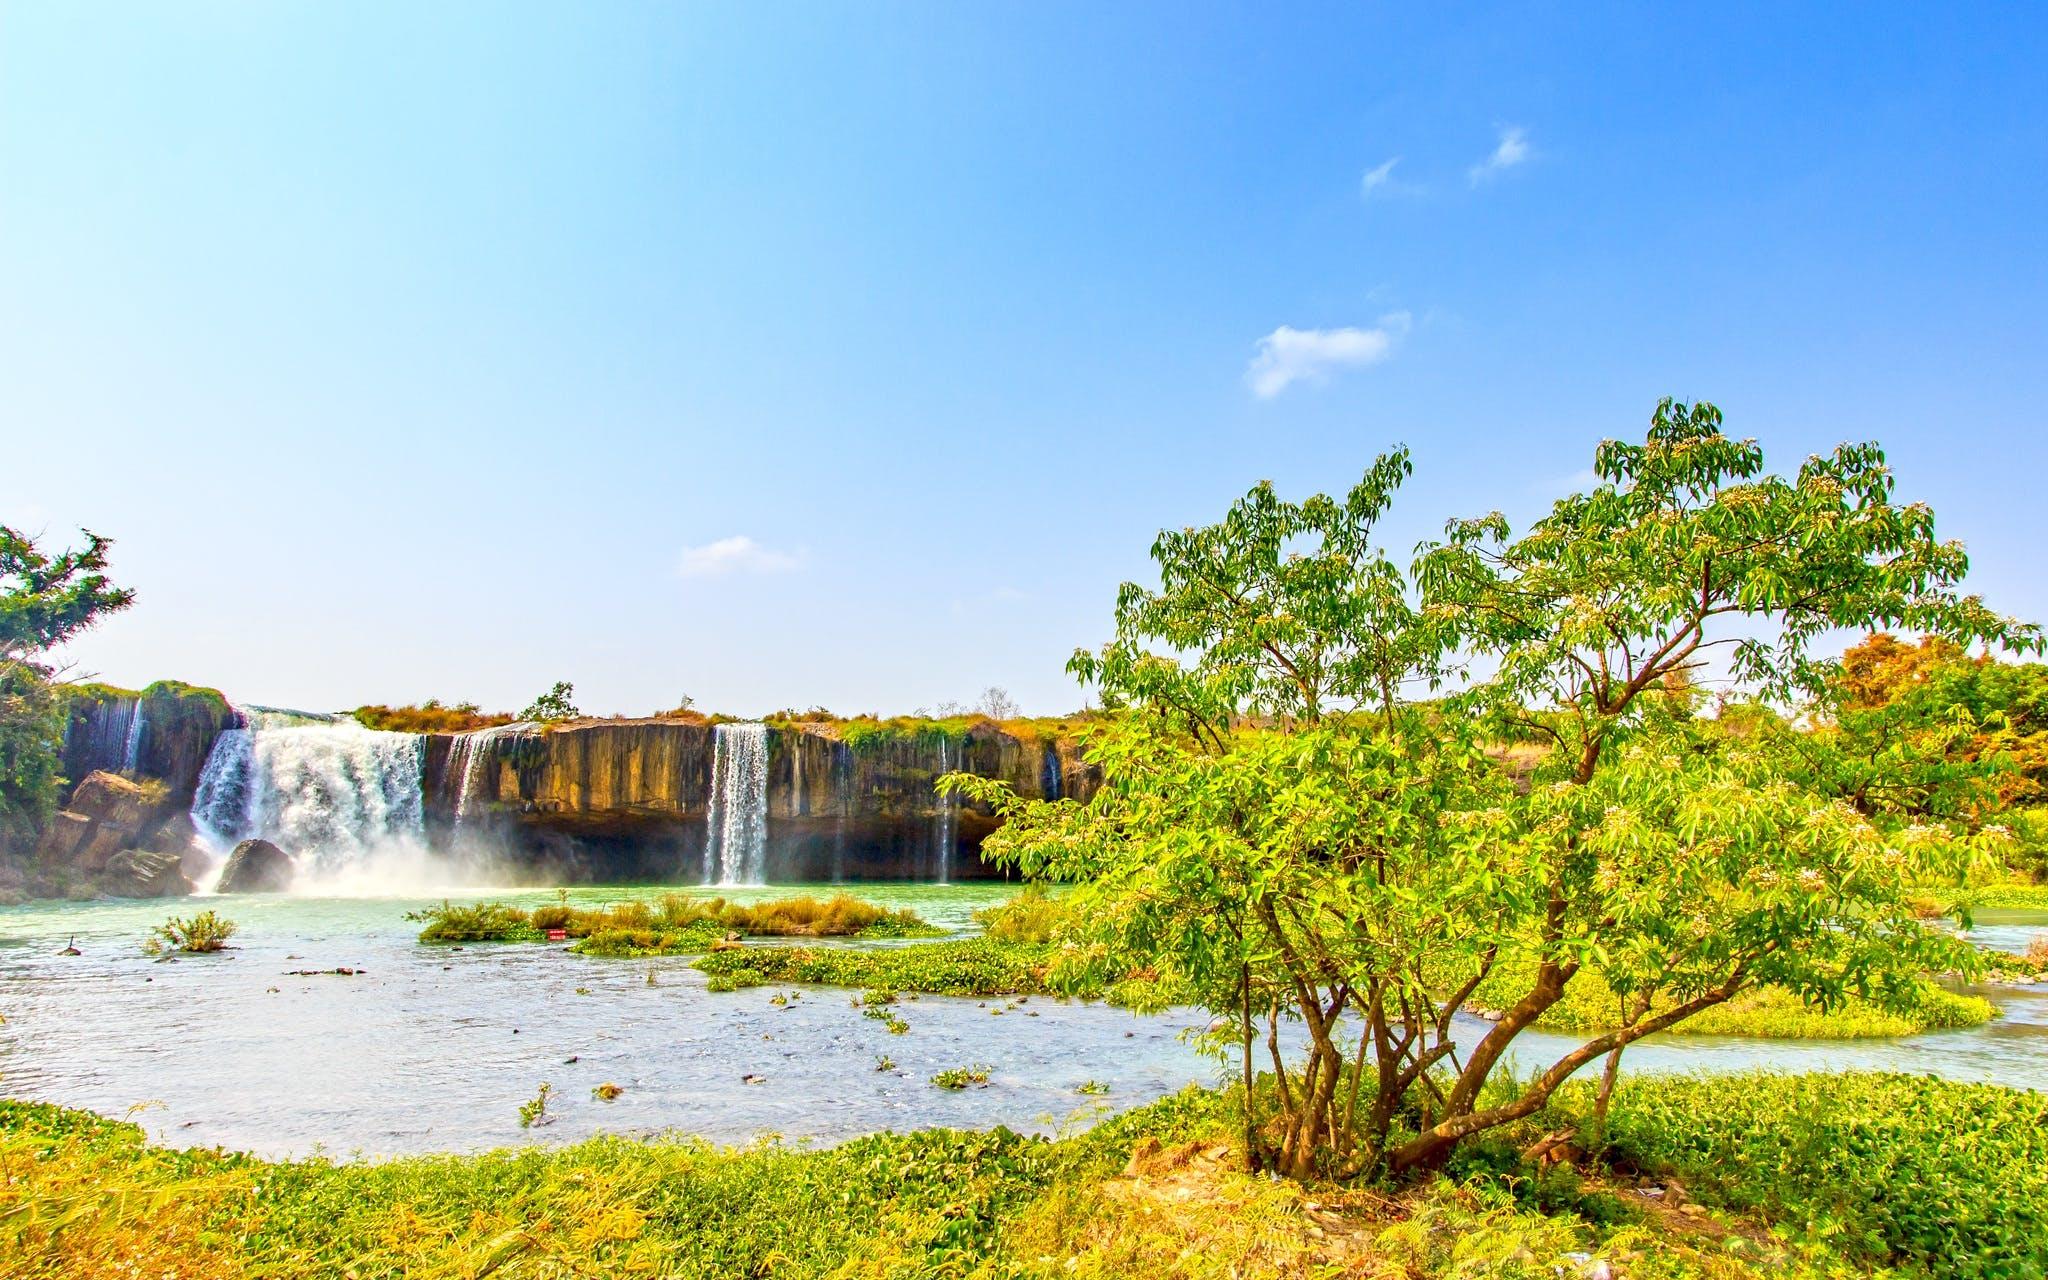 Fotos de stock gratuitas de agua, árbol, cascadas, césped